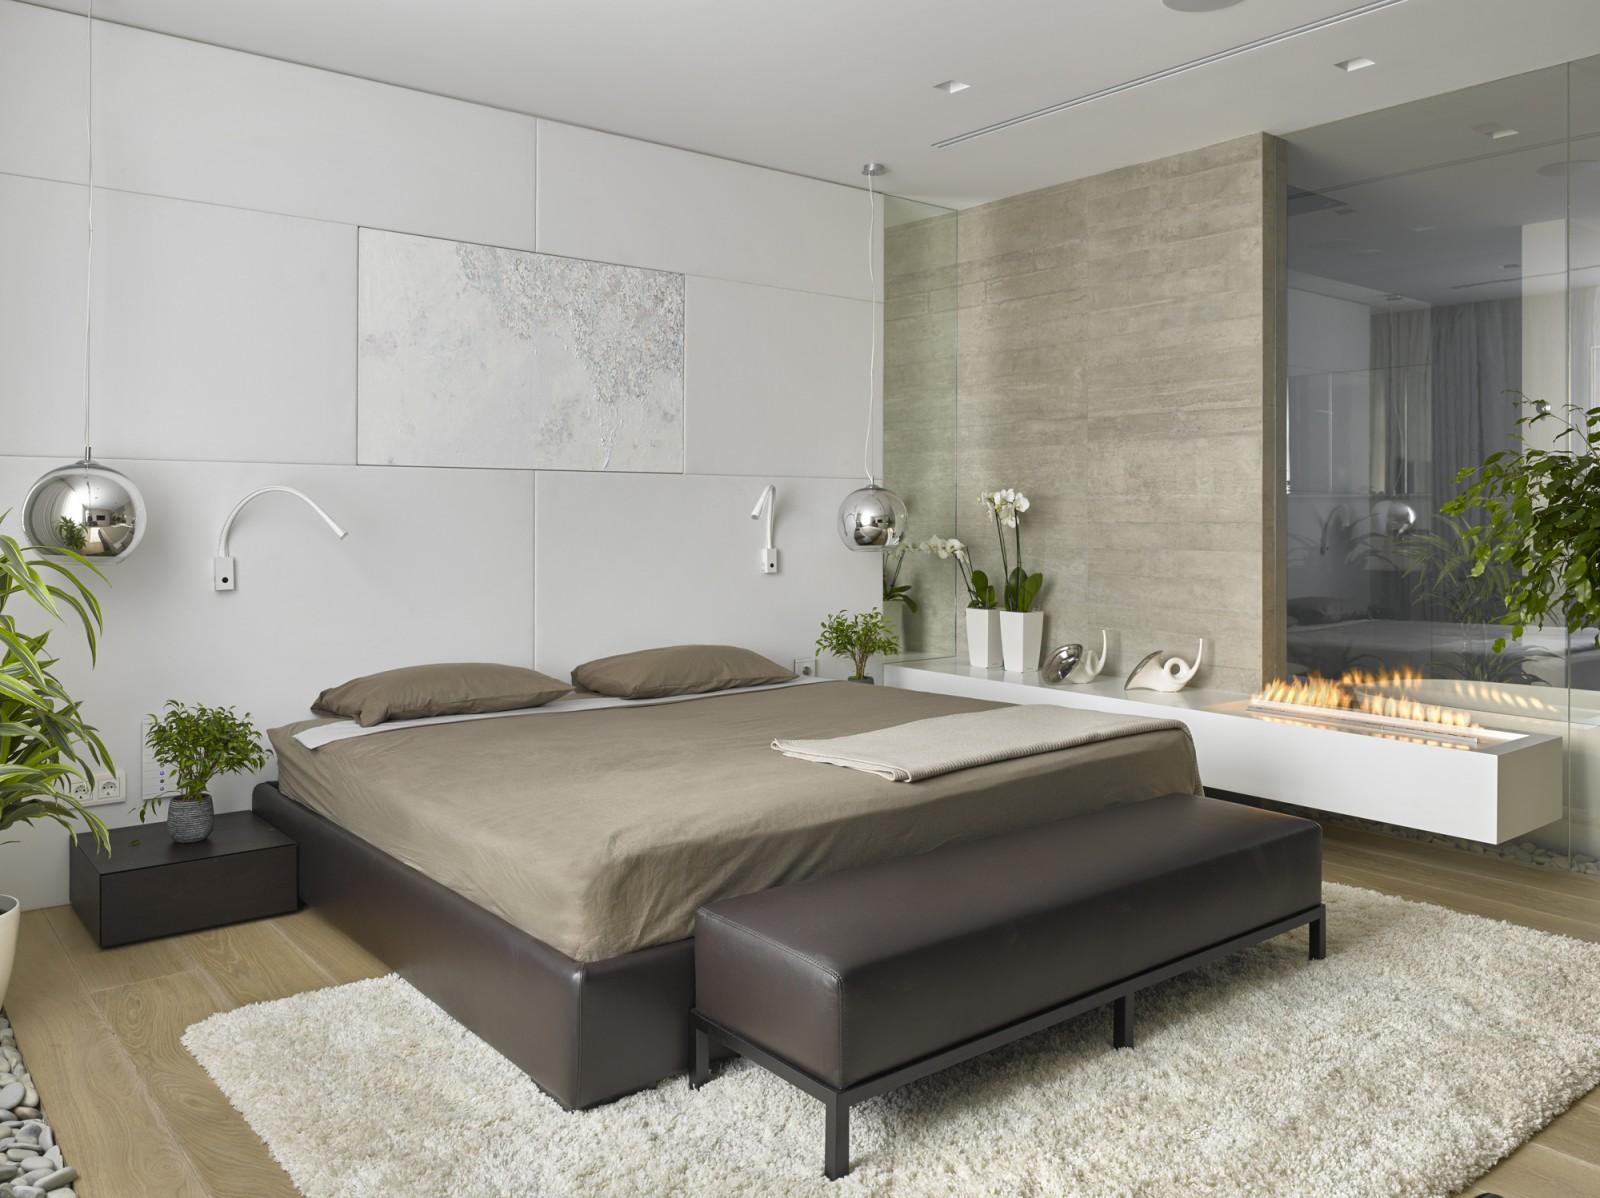 View In Gallery Reka Bentuk Dan Hiasan Dalaman Bilik Tidur Warna Terang